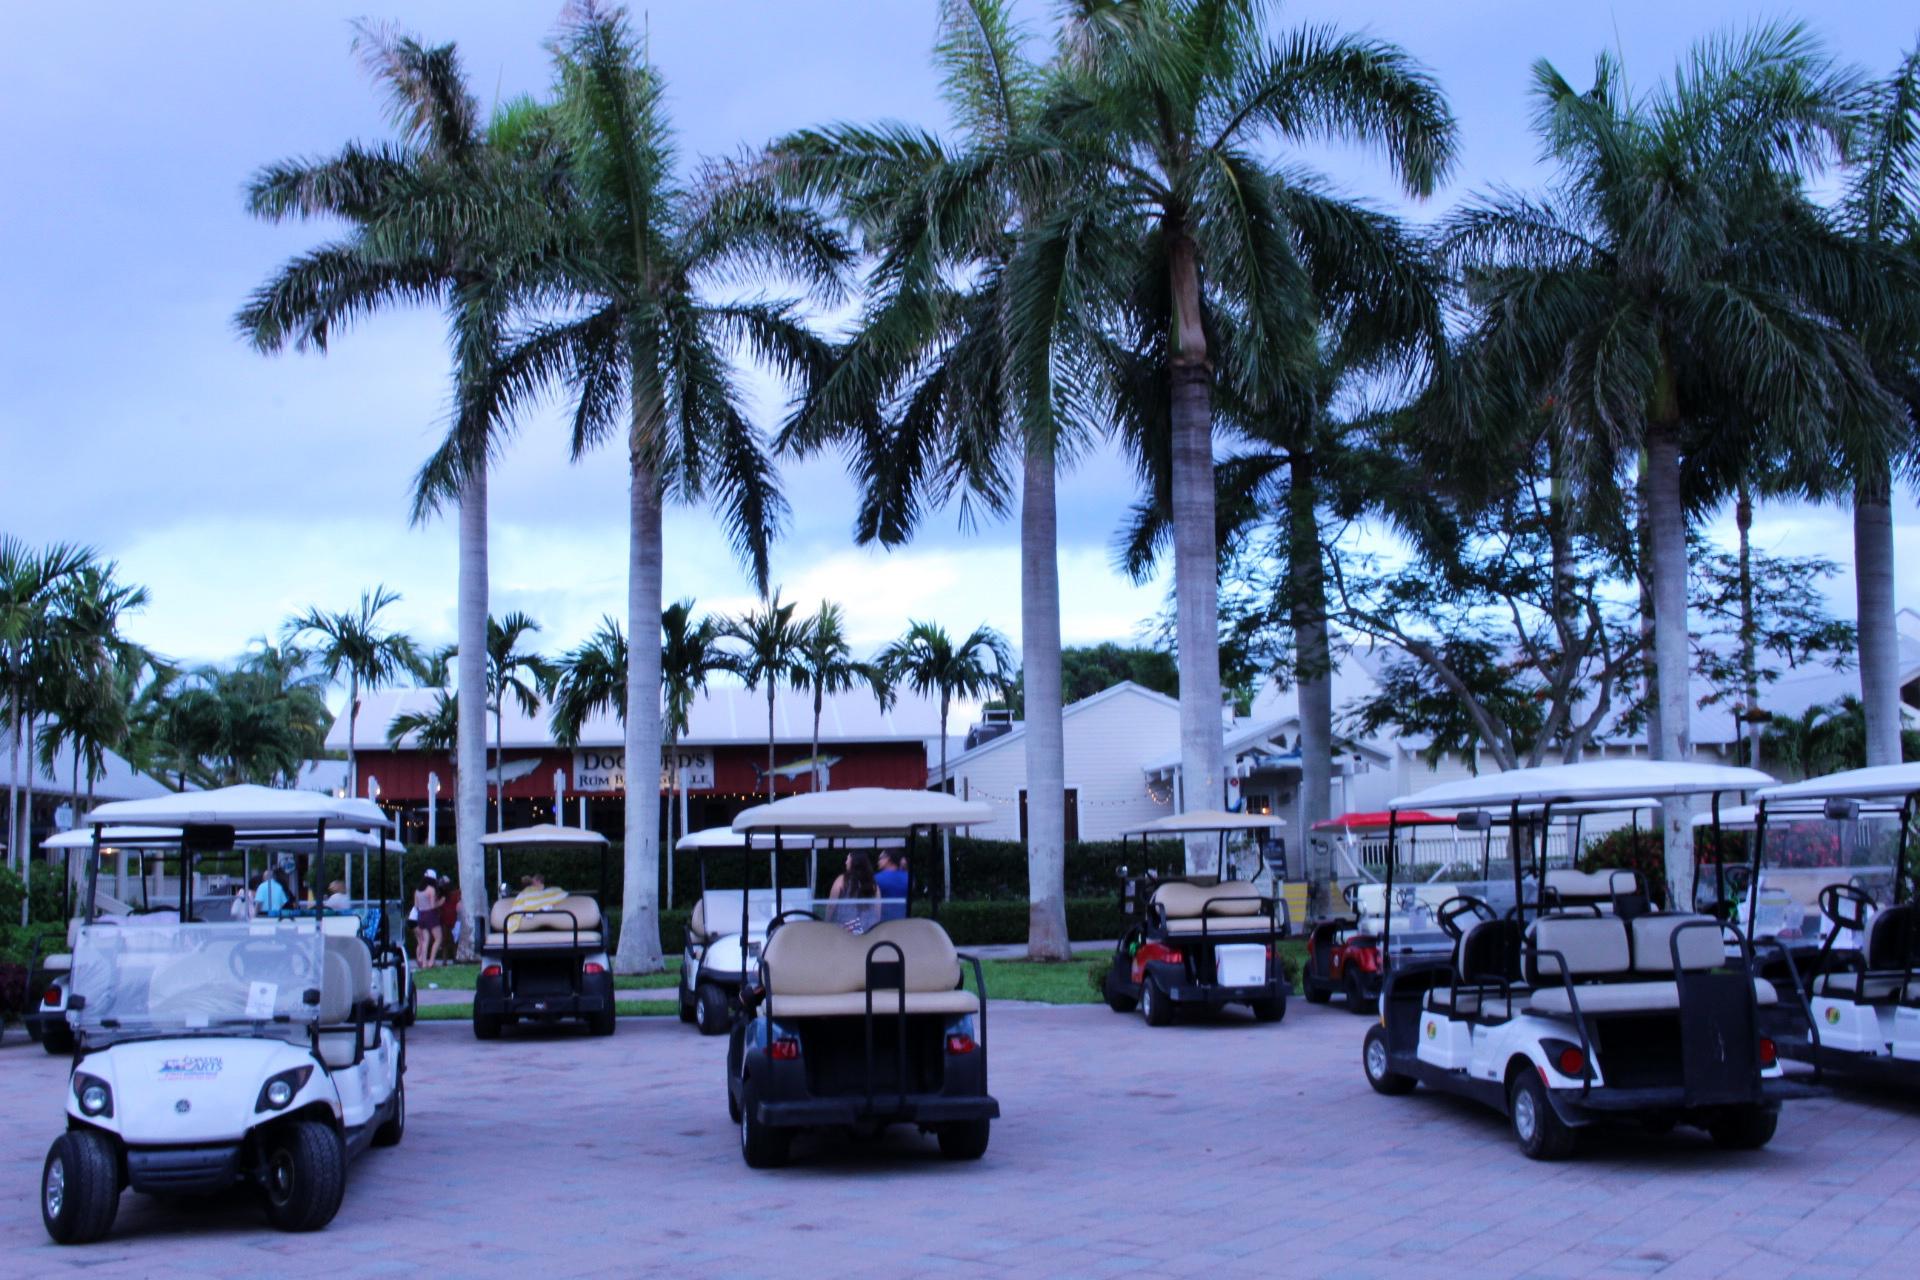 florida-vacation-edit-24.jpg